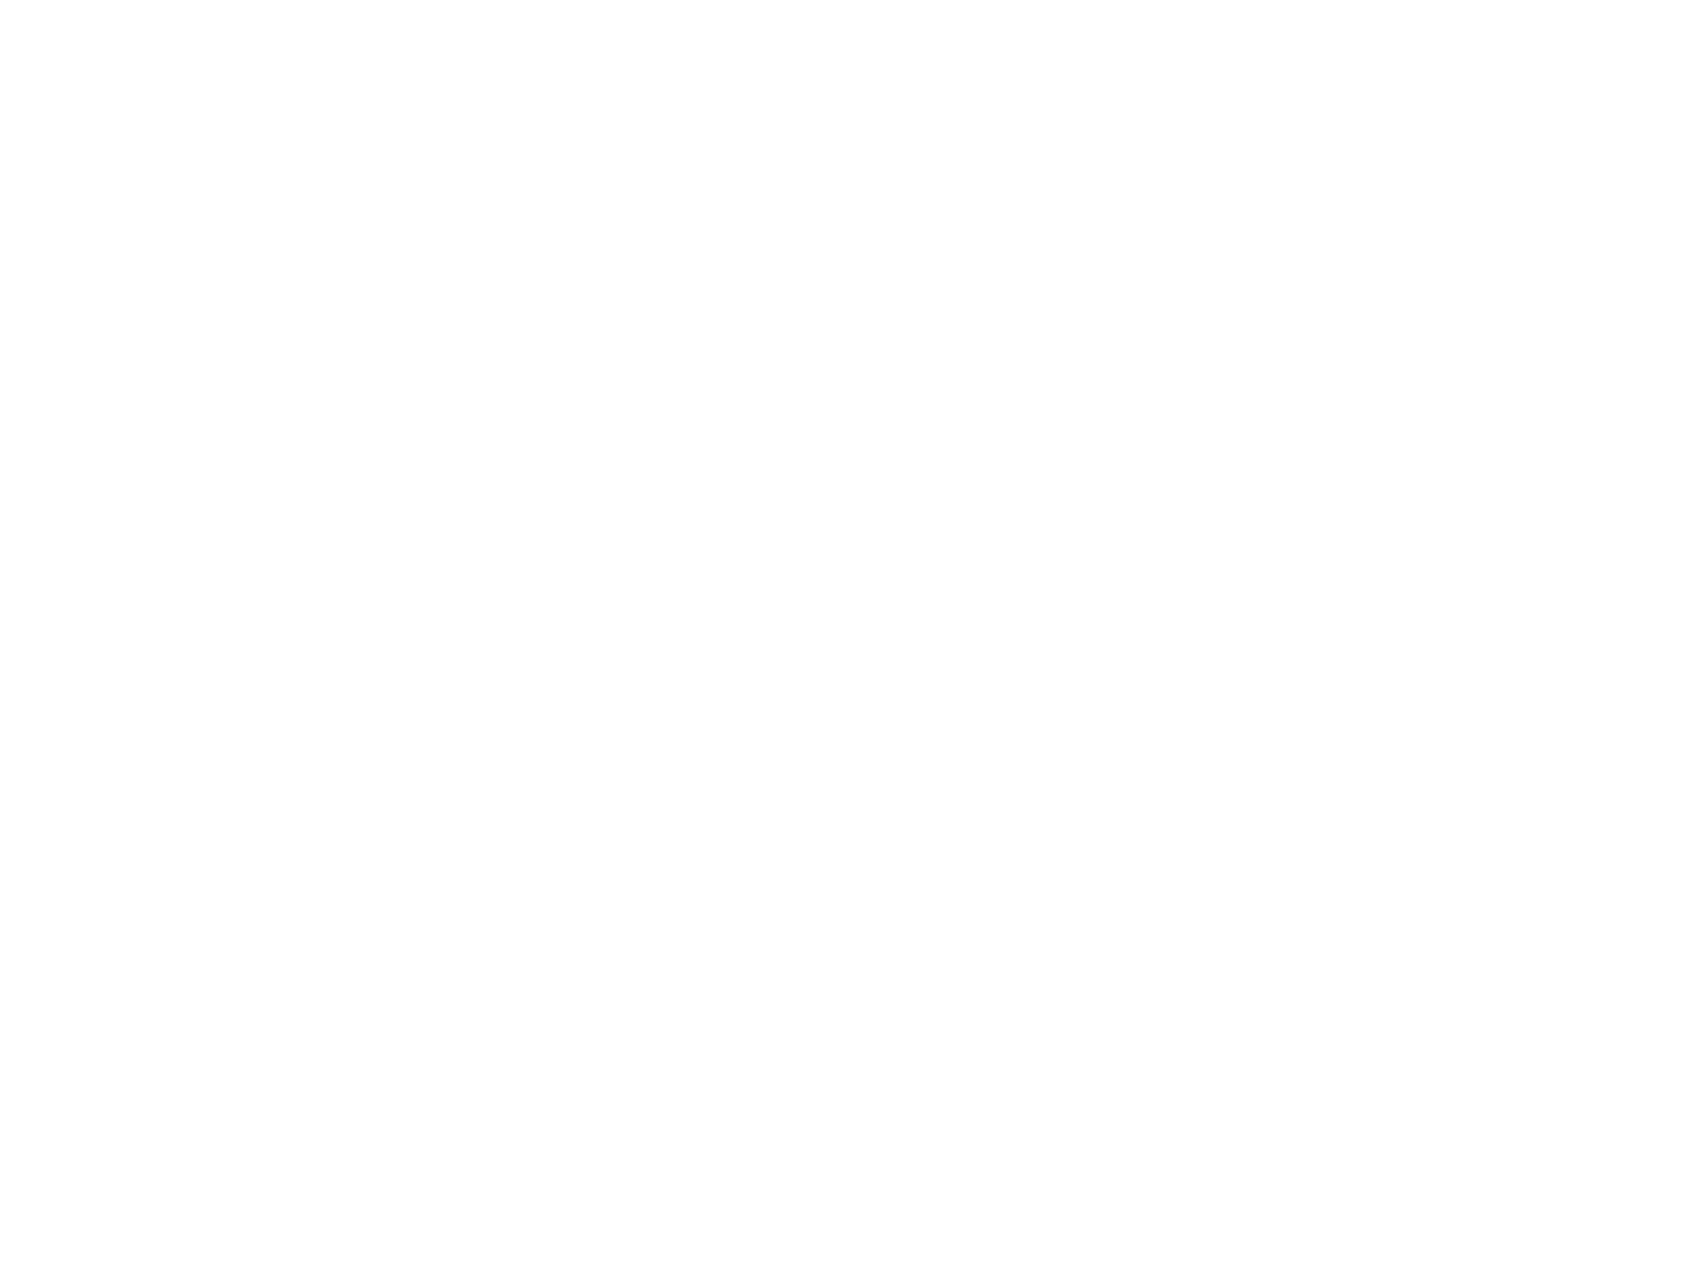 logo-evadeo-pro-blanc-1700bon